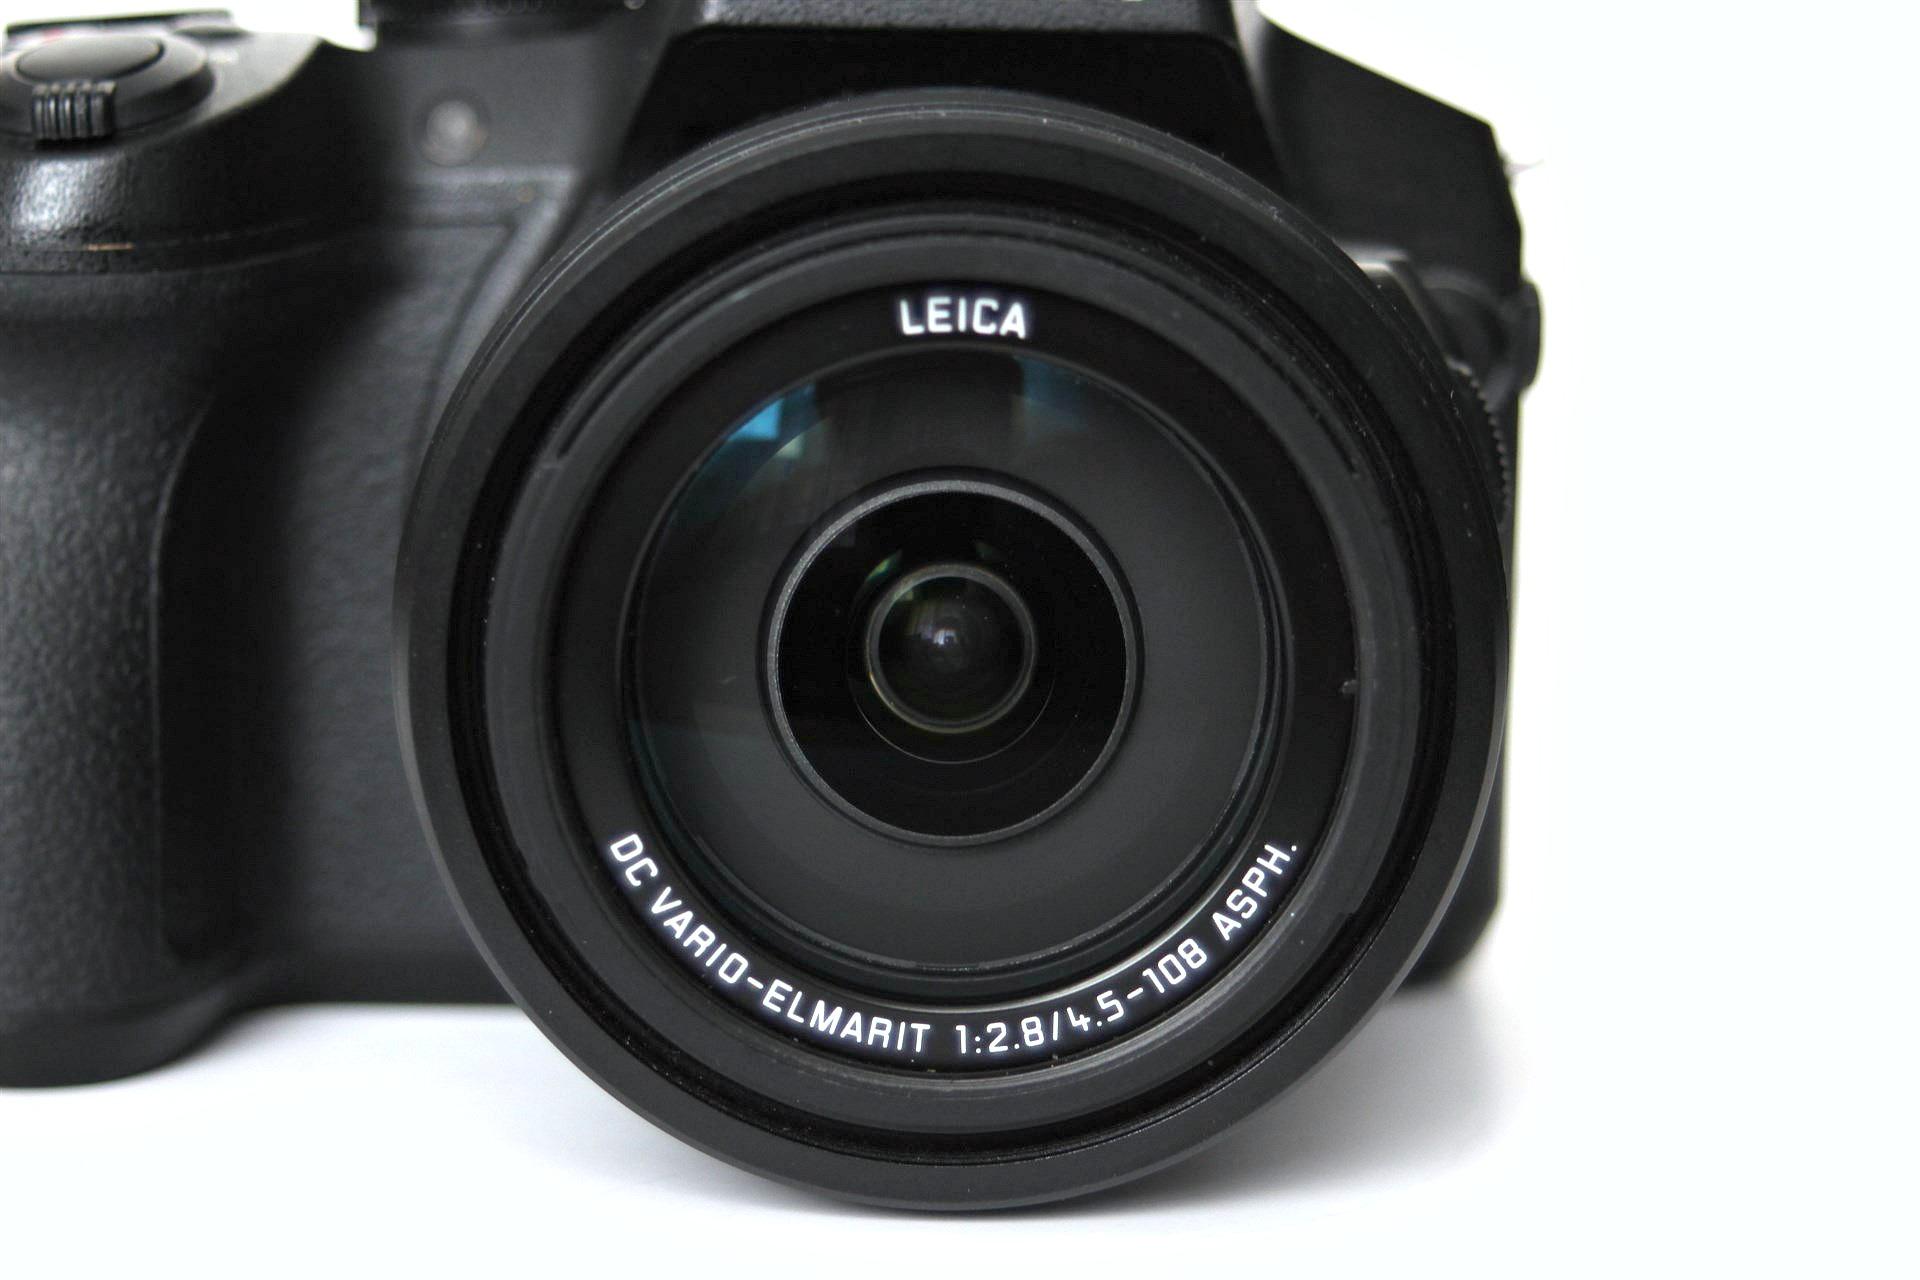 panasonic-lumix-dmc-fz300-5